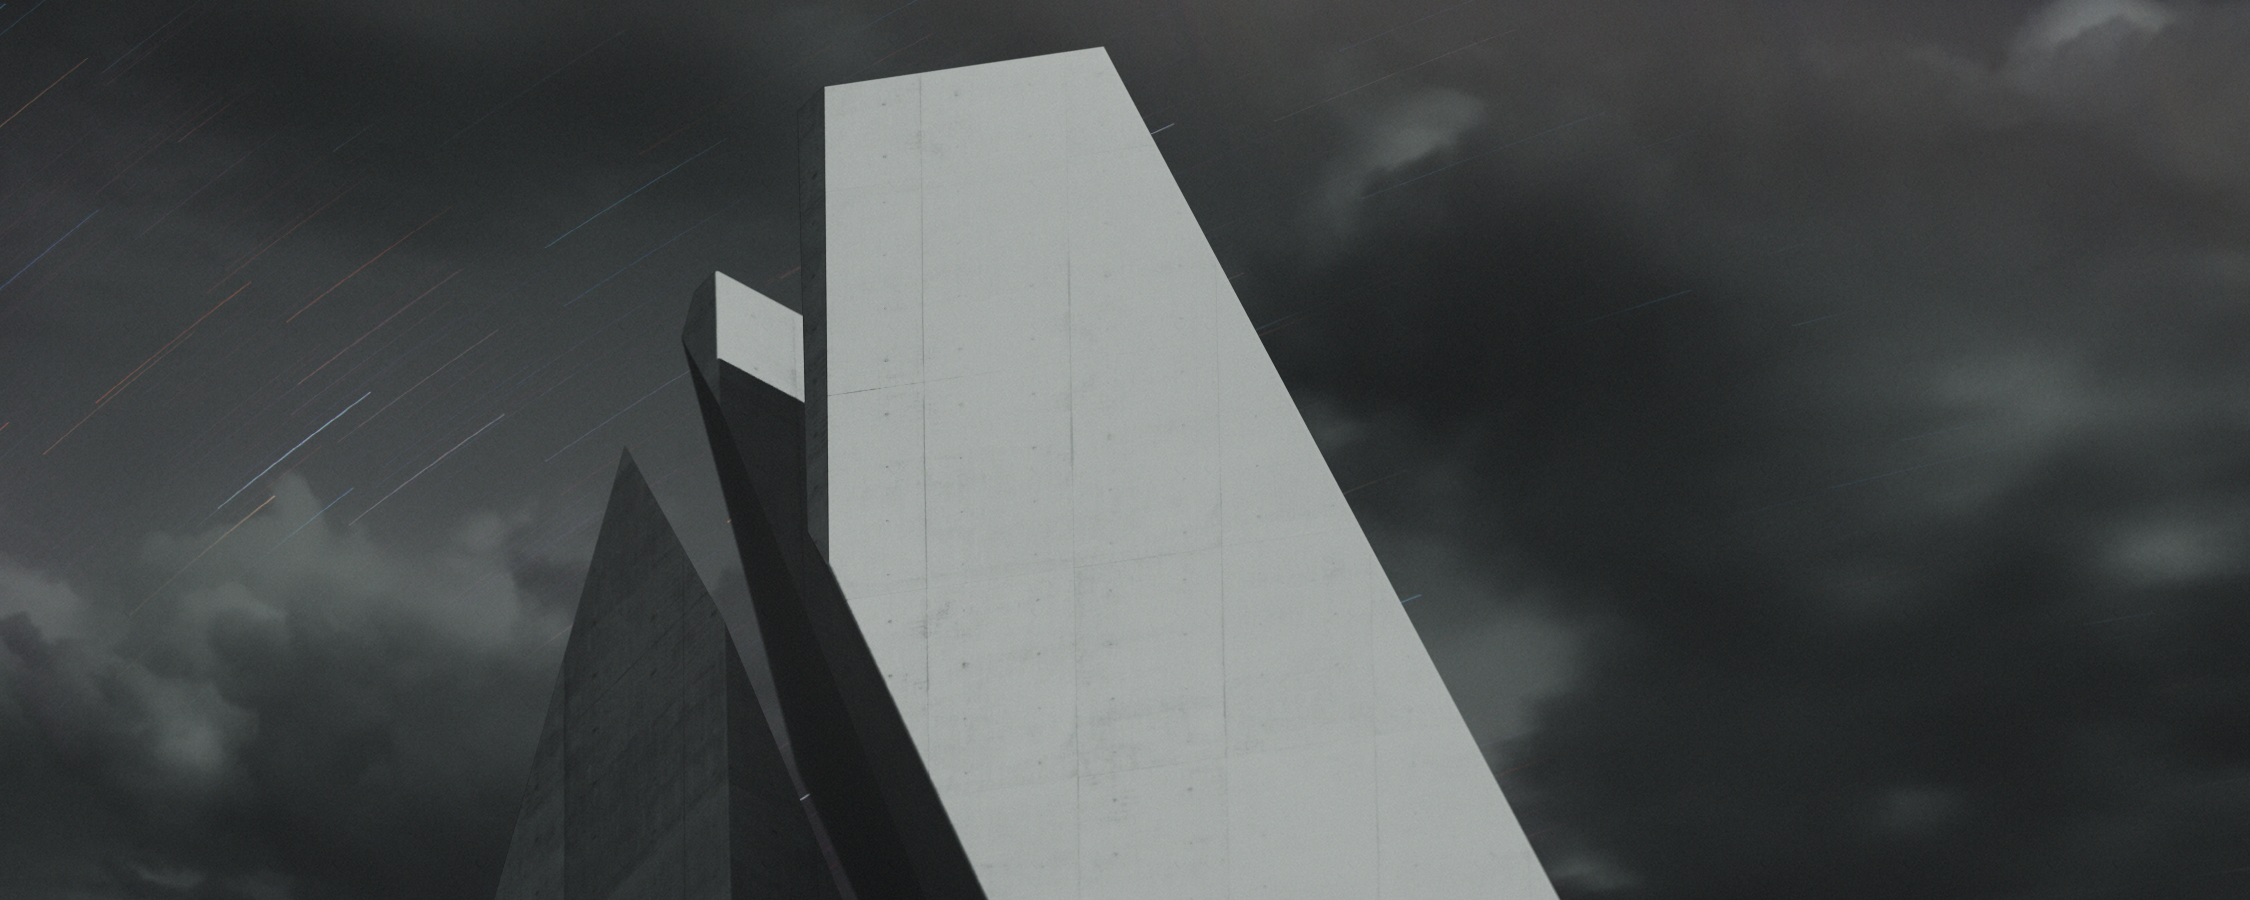 08-DT-A-01-1.jpg